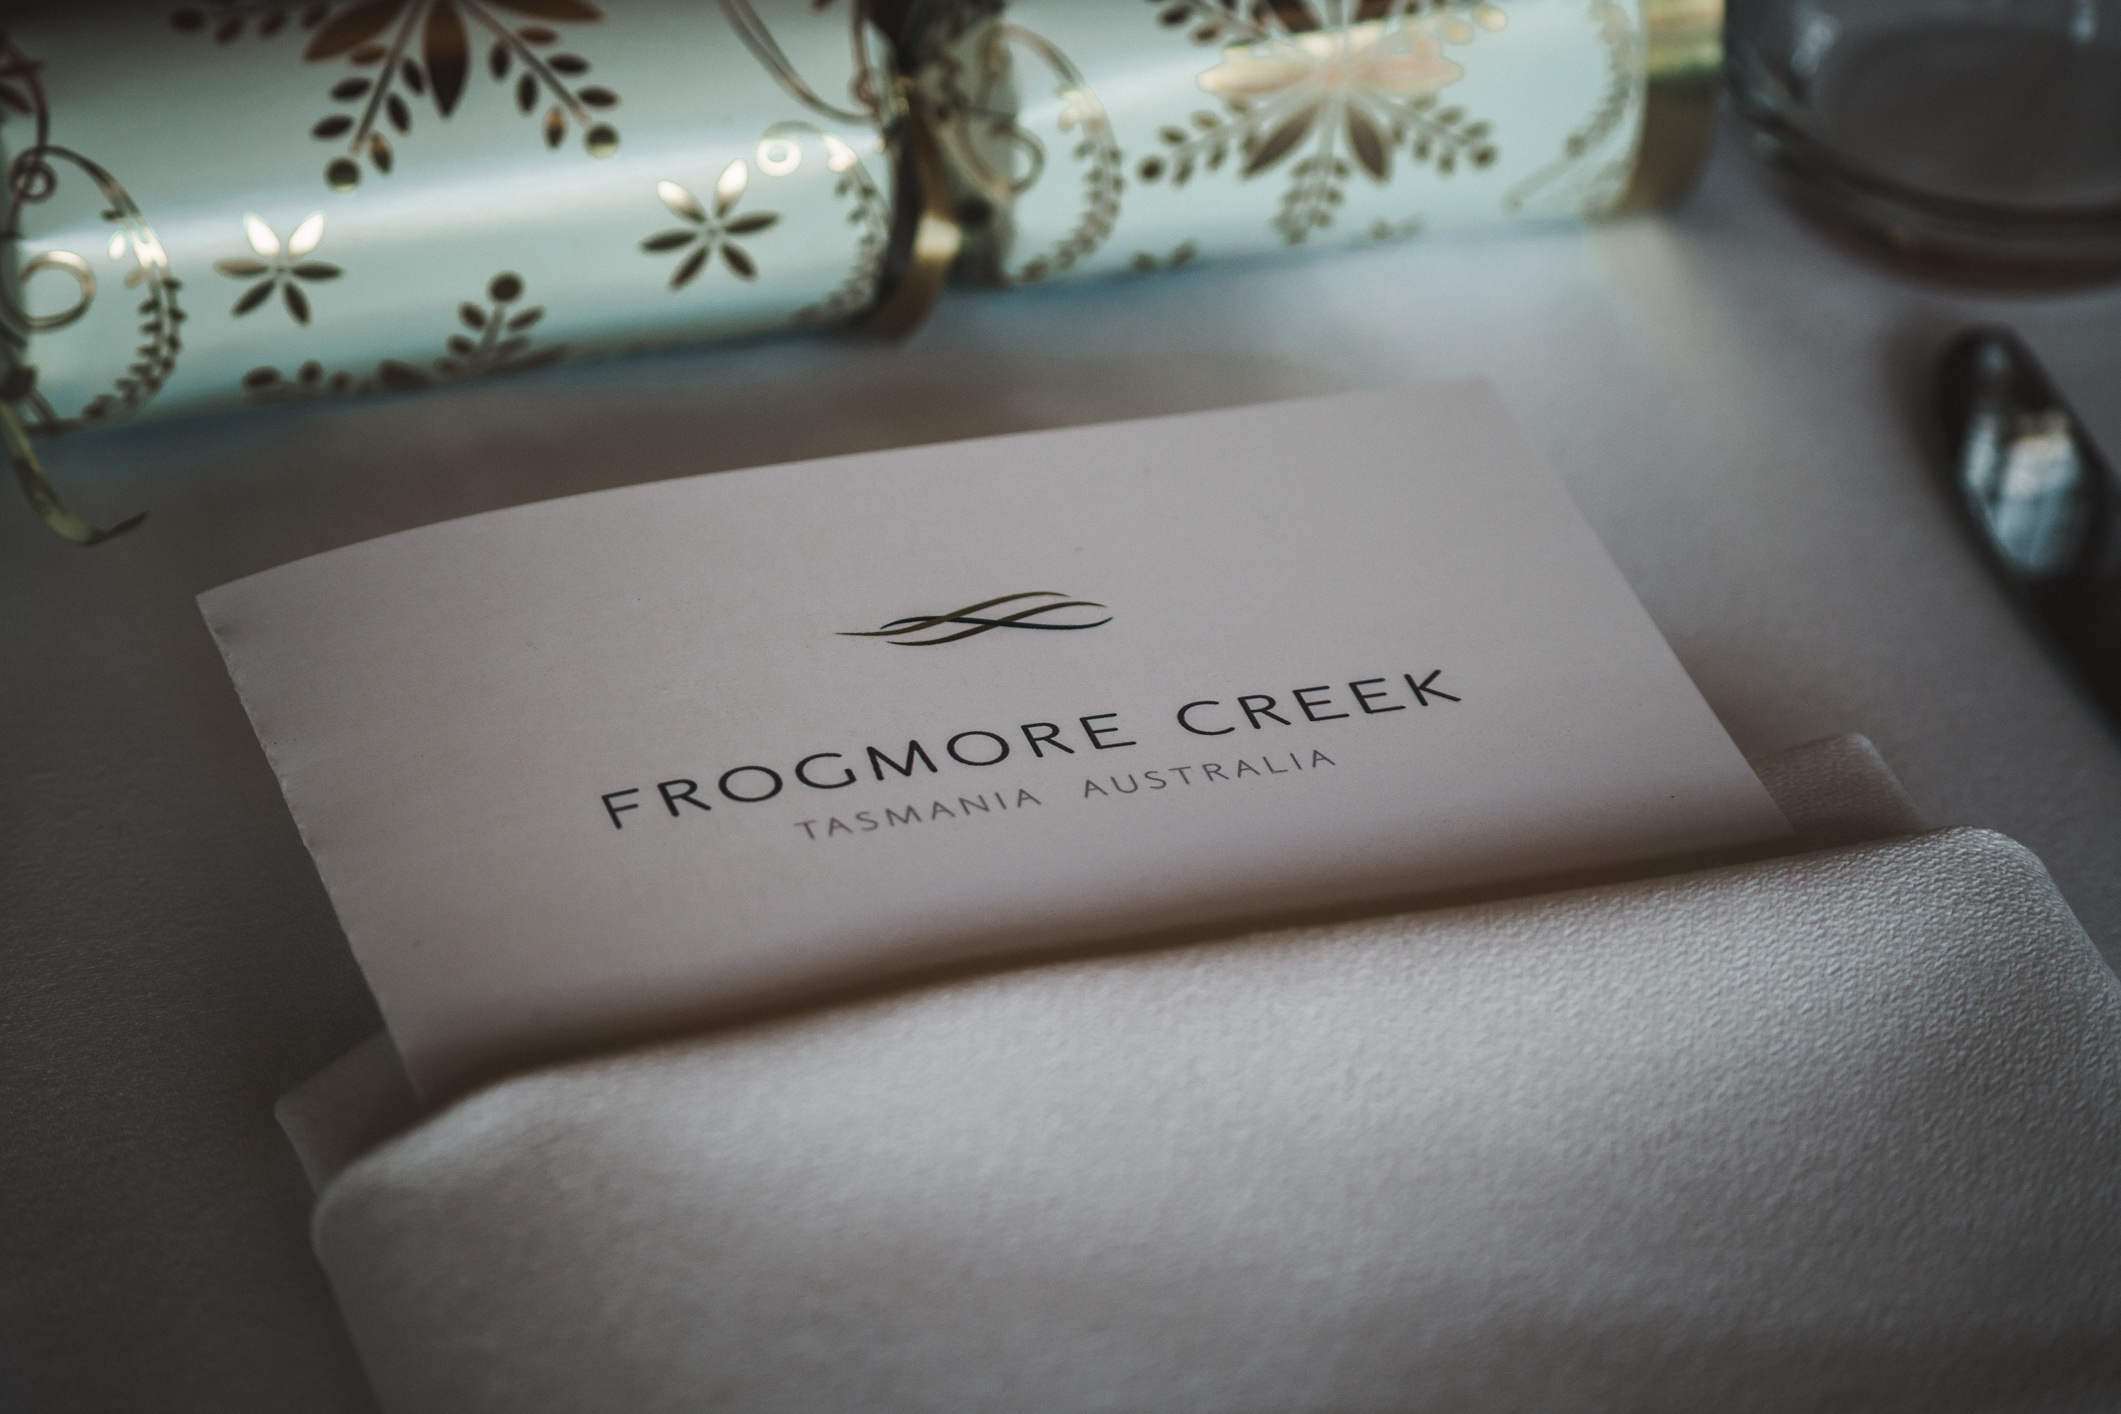 Frogmore Creek (Web) (4 of 8).jpg